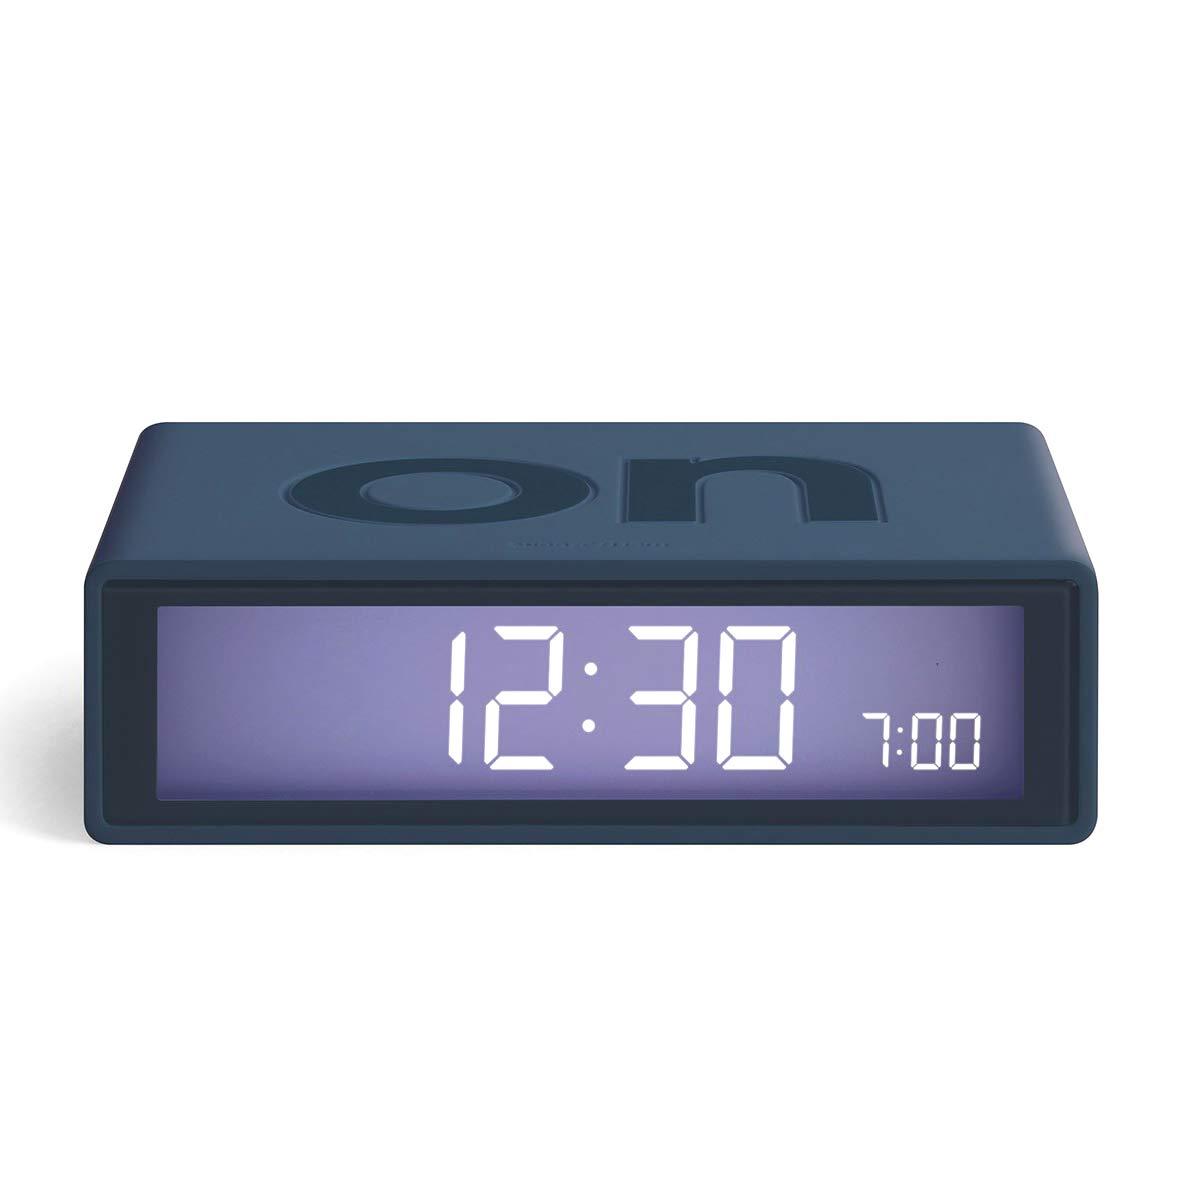 LEXON Flip+ LCD alarm clock LR150BF9 dark blue | the design gift shop